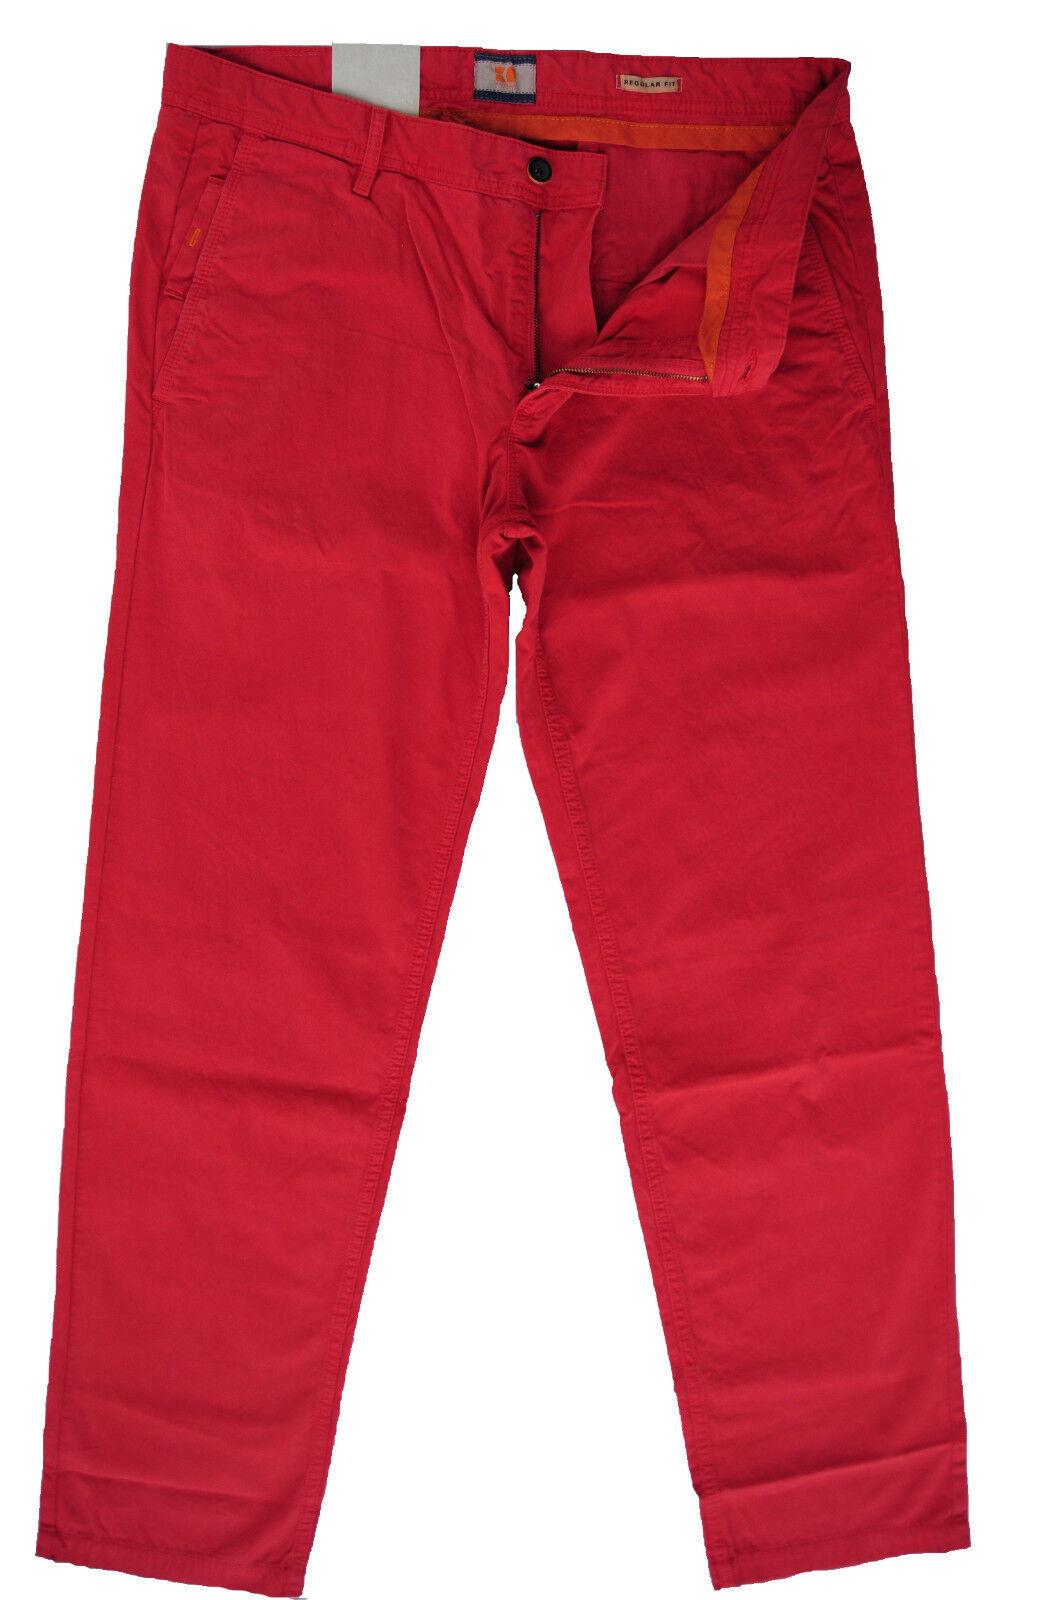 NEU W33 L34 W33 L36 HUGO BOSS HOSE Orange SCHINO-REGULAR-D 50184757